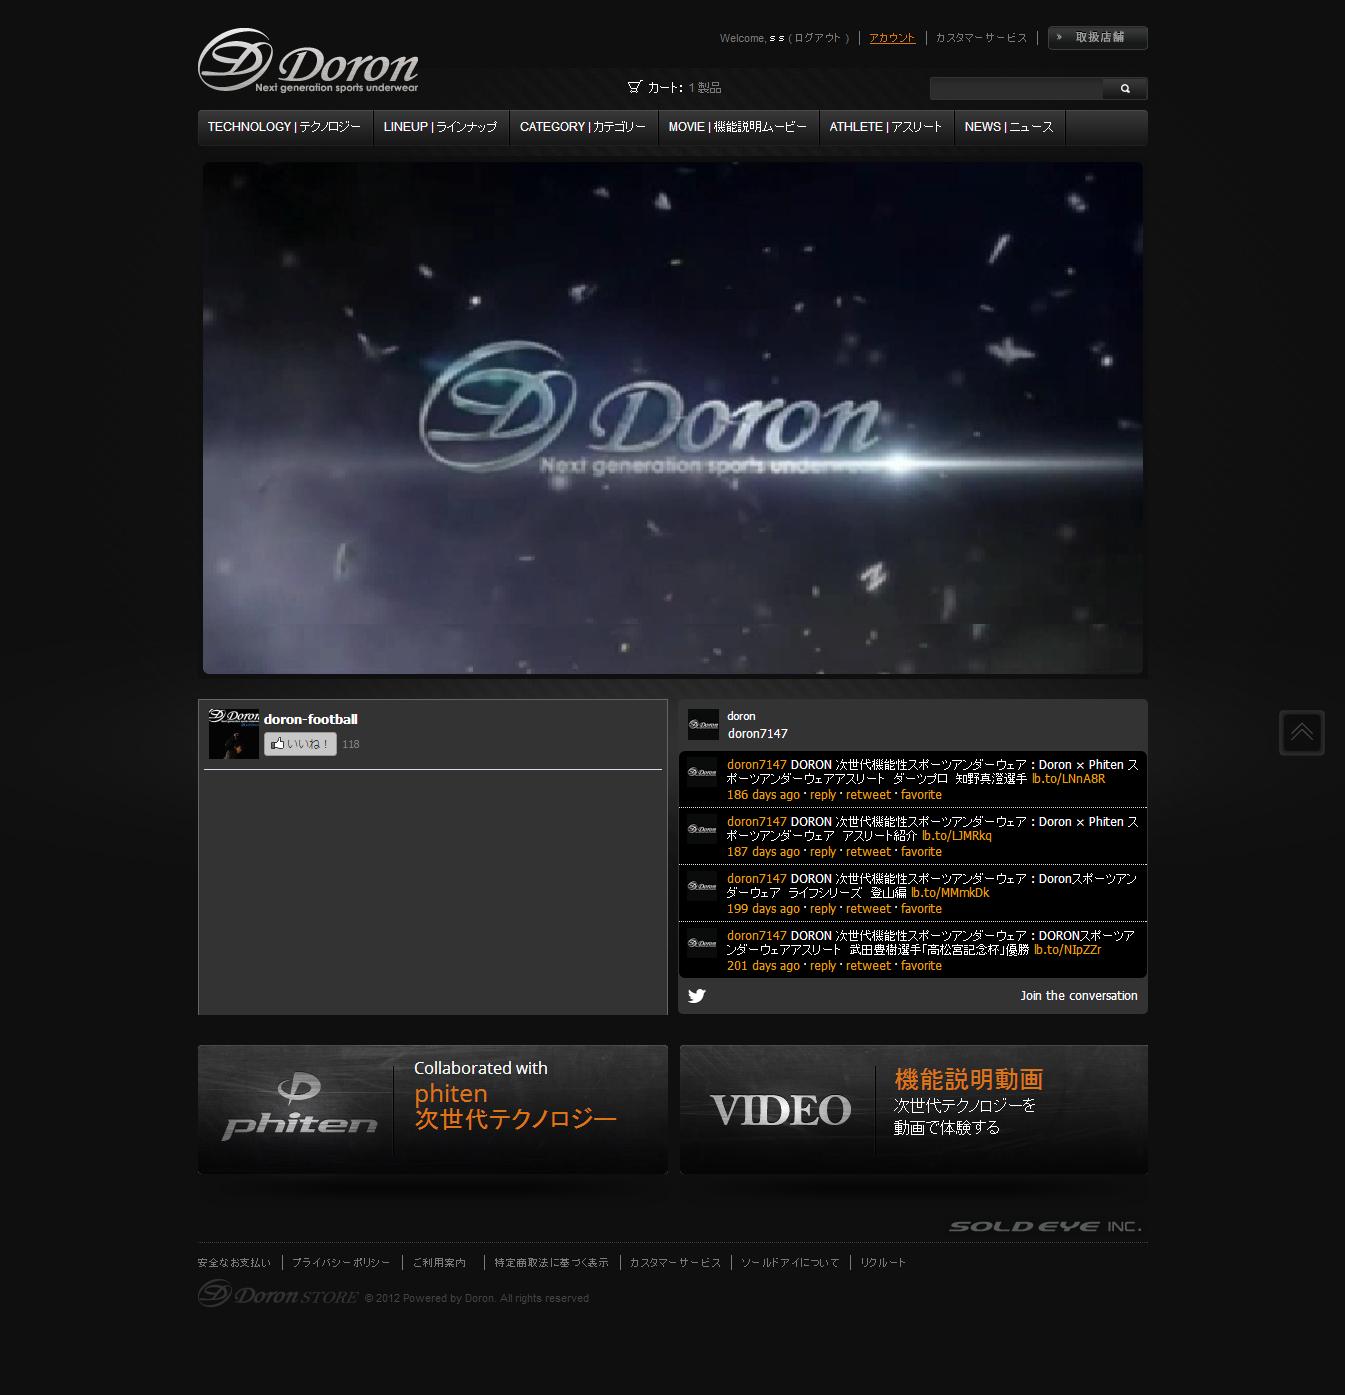 Doronドロンオフィシャルwebサイト ECサイト制作事例